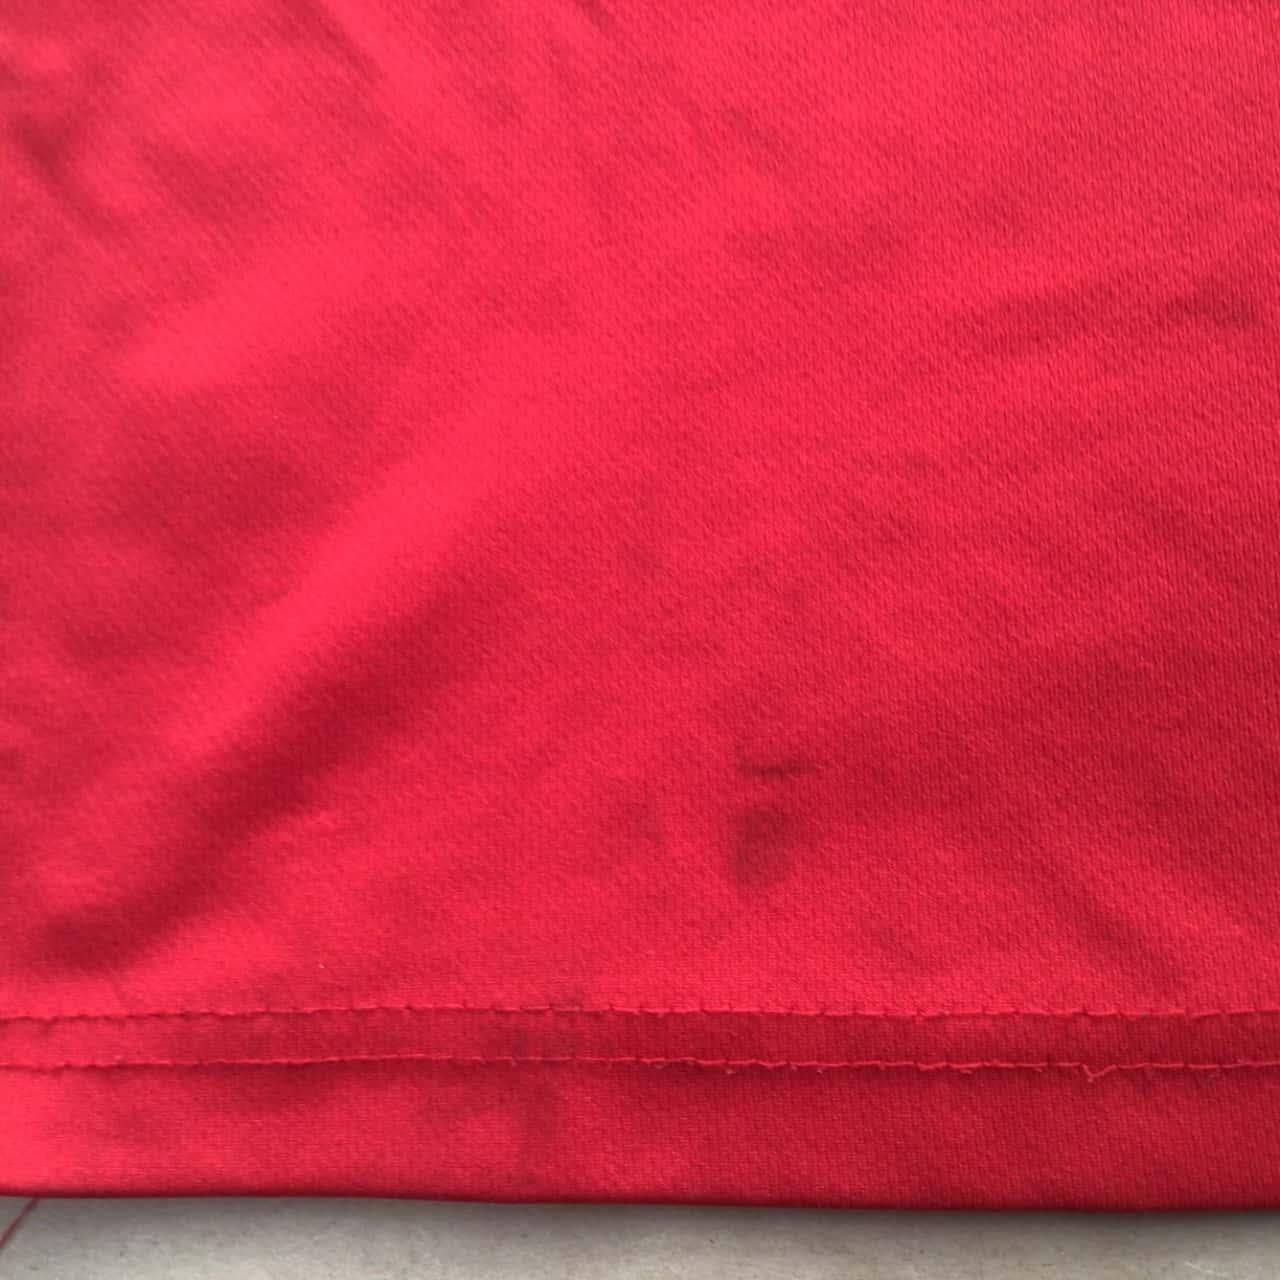 Kids ADIDAS NBA WASHINGTON #2 WALL BASKETBALL SINGLET  Size M Tops & T-Shirts Blue/Red/White